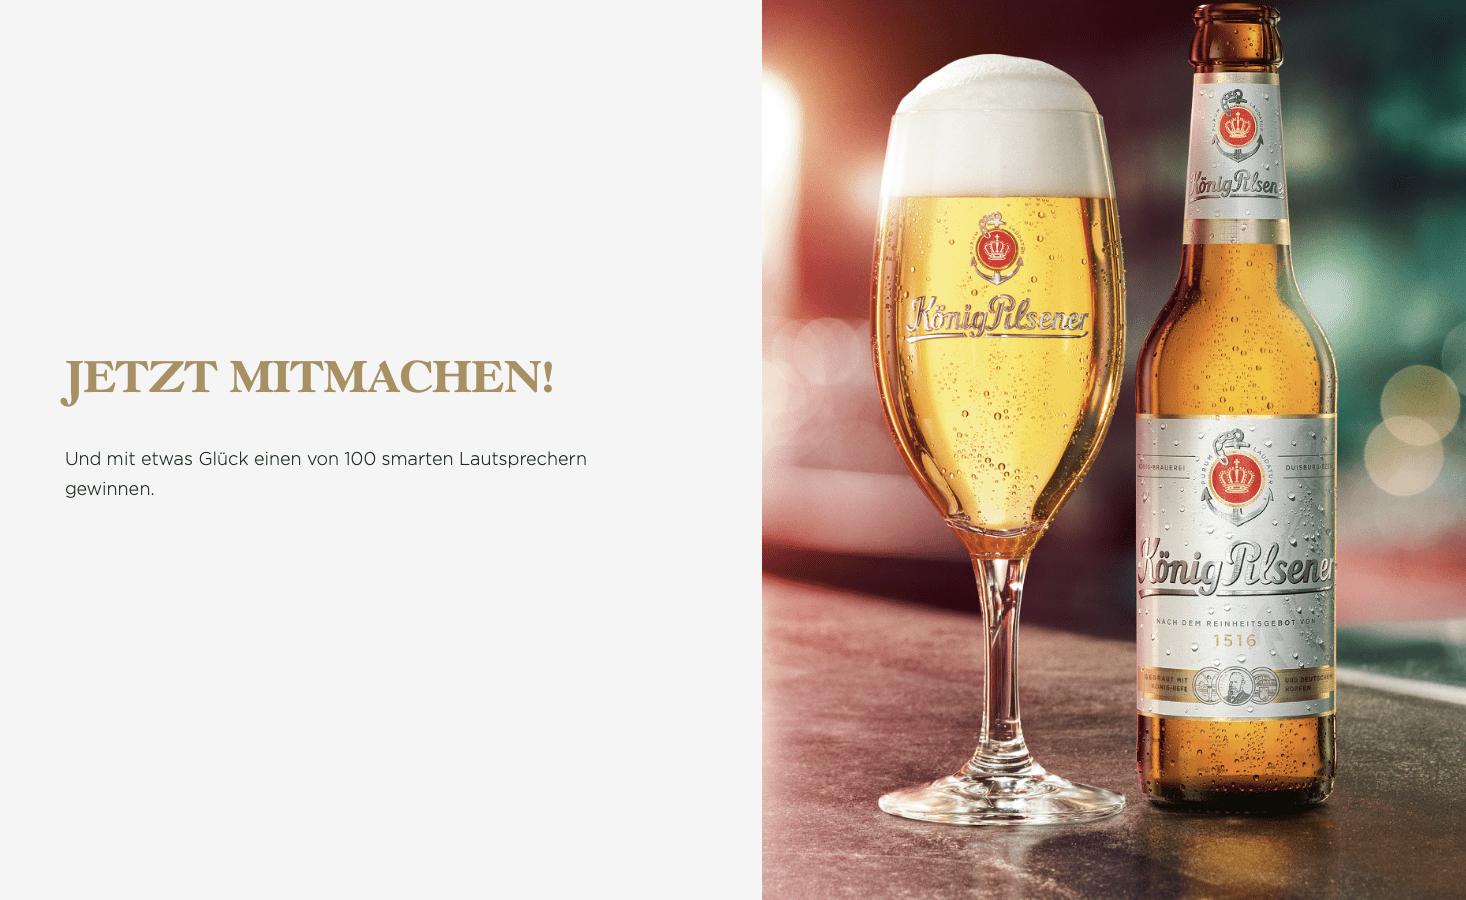 Gewinnspiel-Cases FMCG Getränke König Pilsener